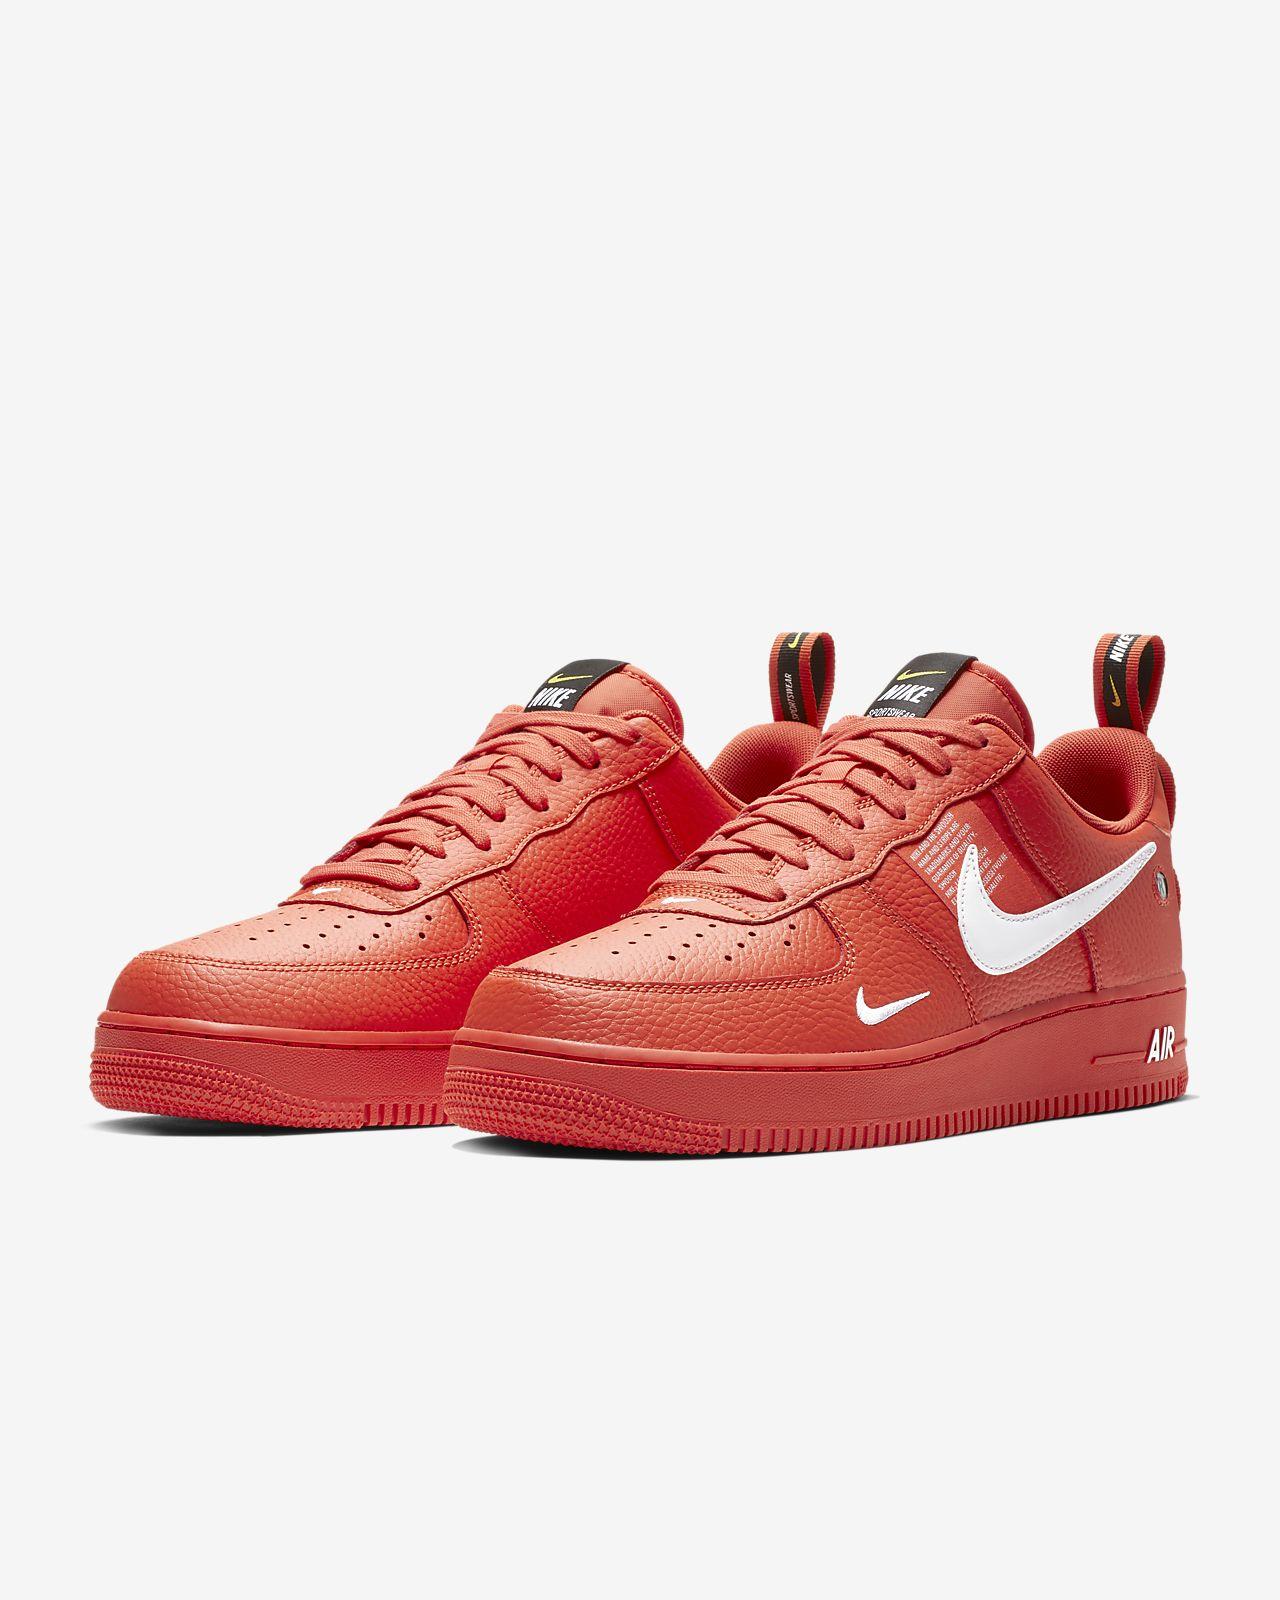 Nike Air Force 1 07 Lv8 Utility 男子运动鞋